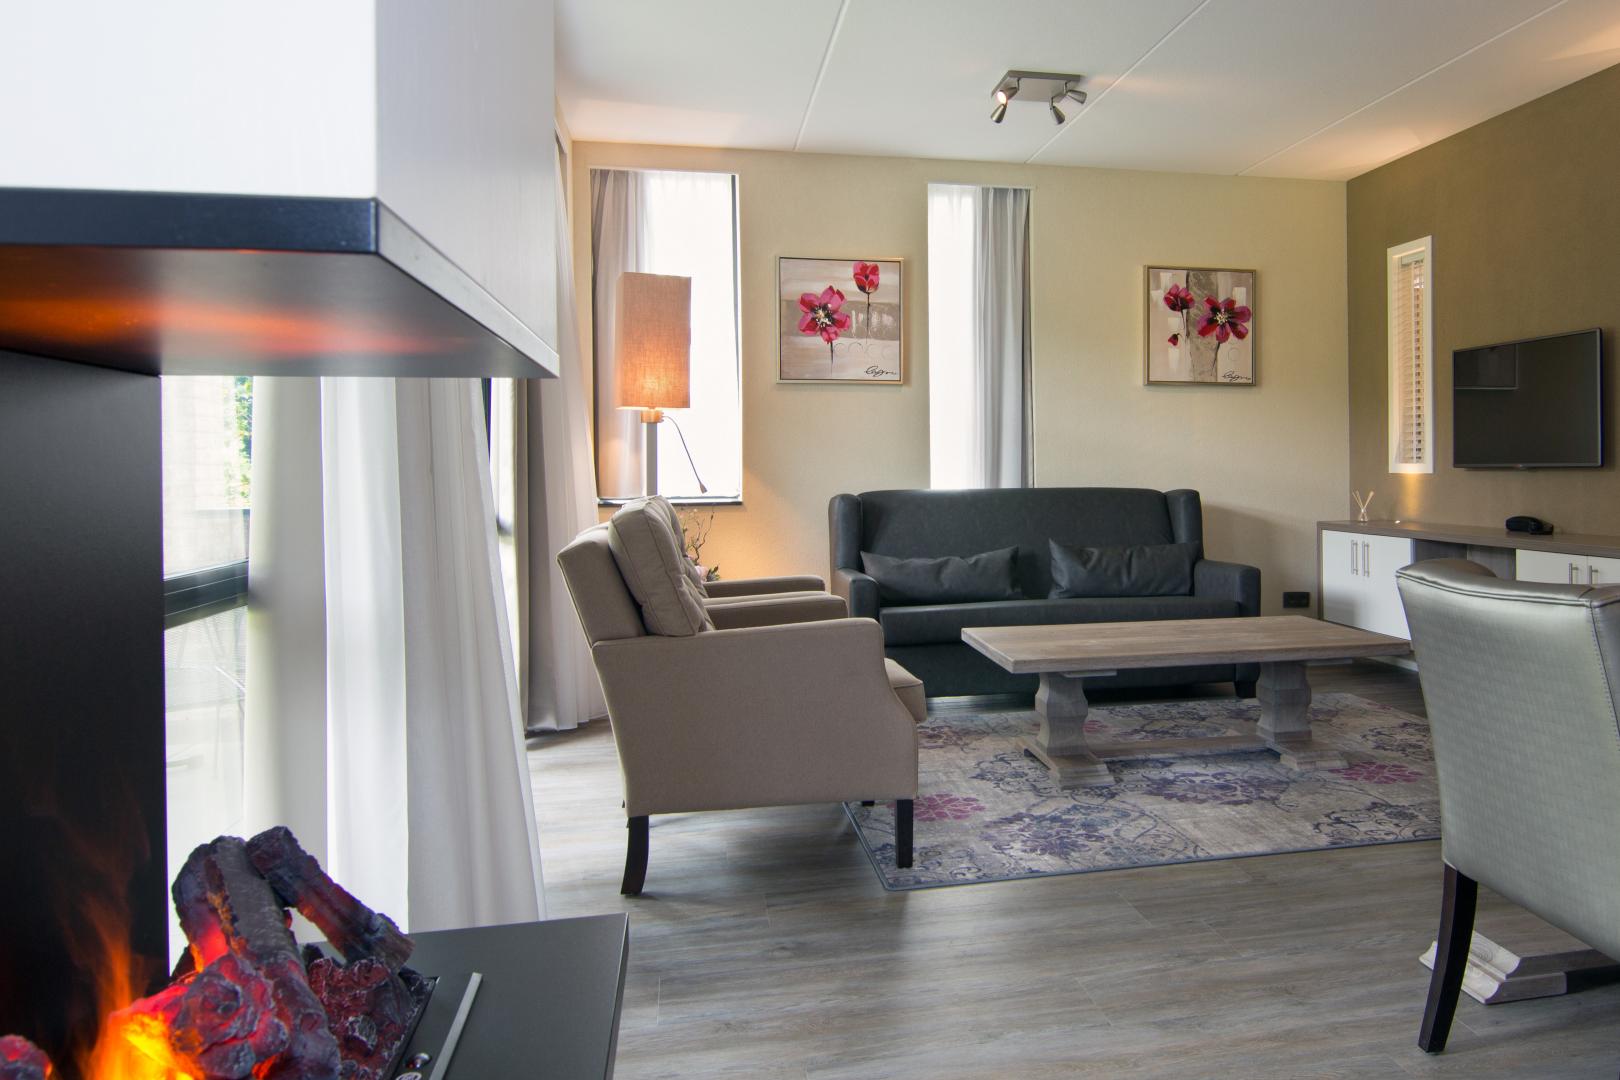 Marveld Tournament - Hotel Havezate Marveld - Room